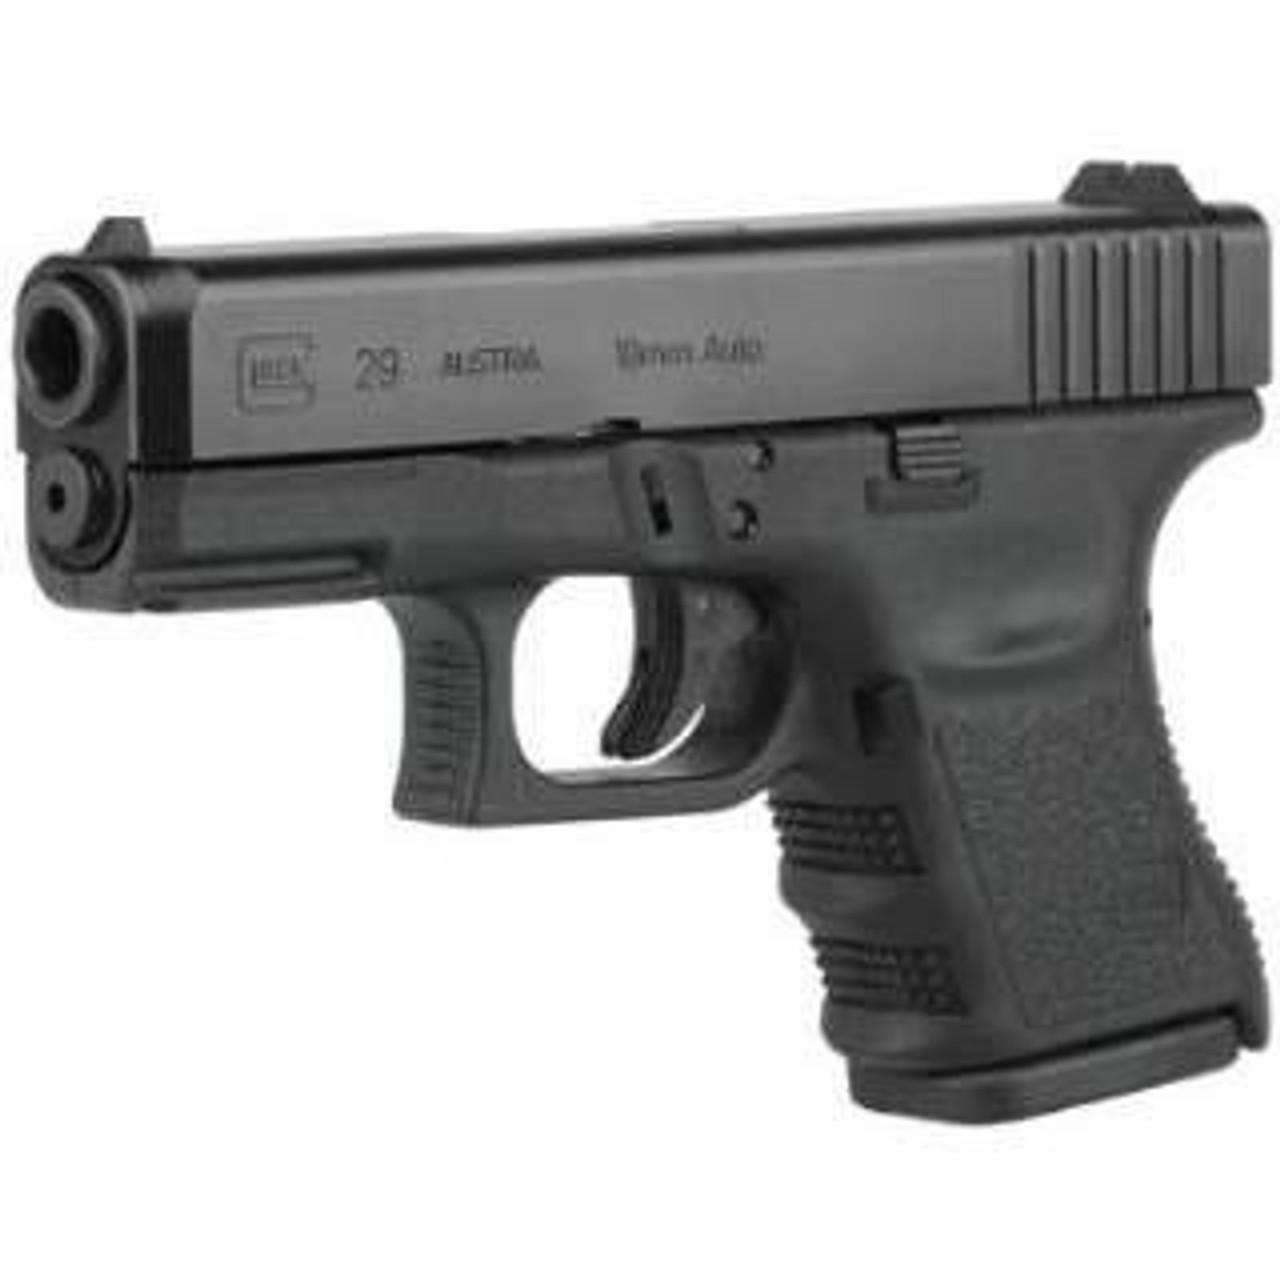 Glock 29 Gen3 CALIFORNIA LEGAL - 10mm